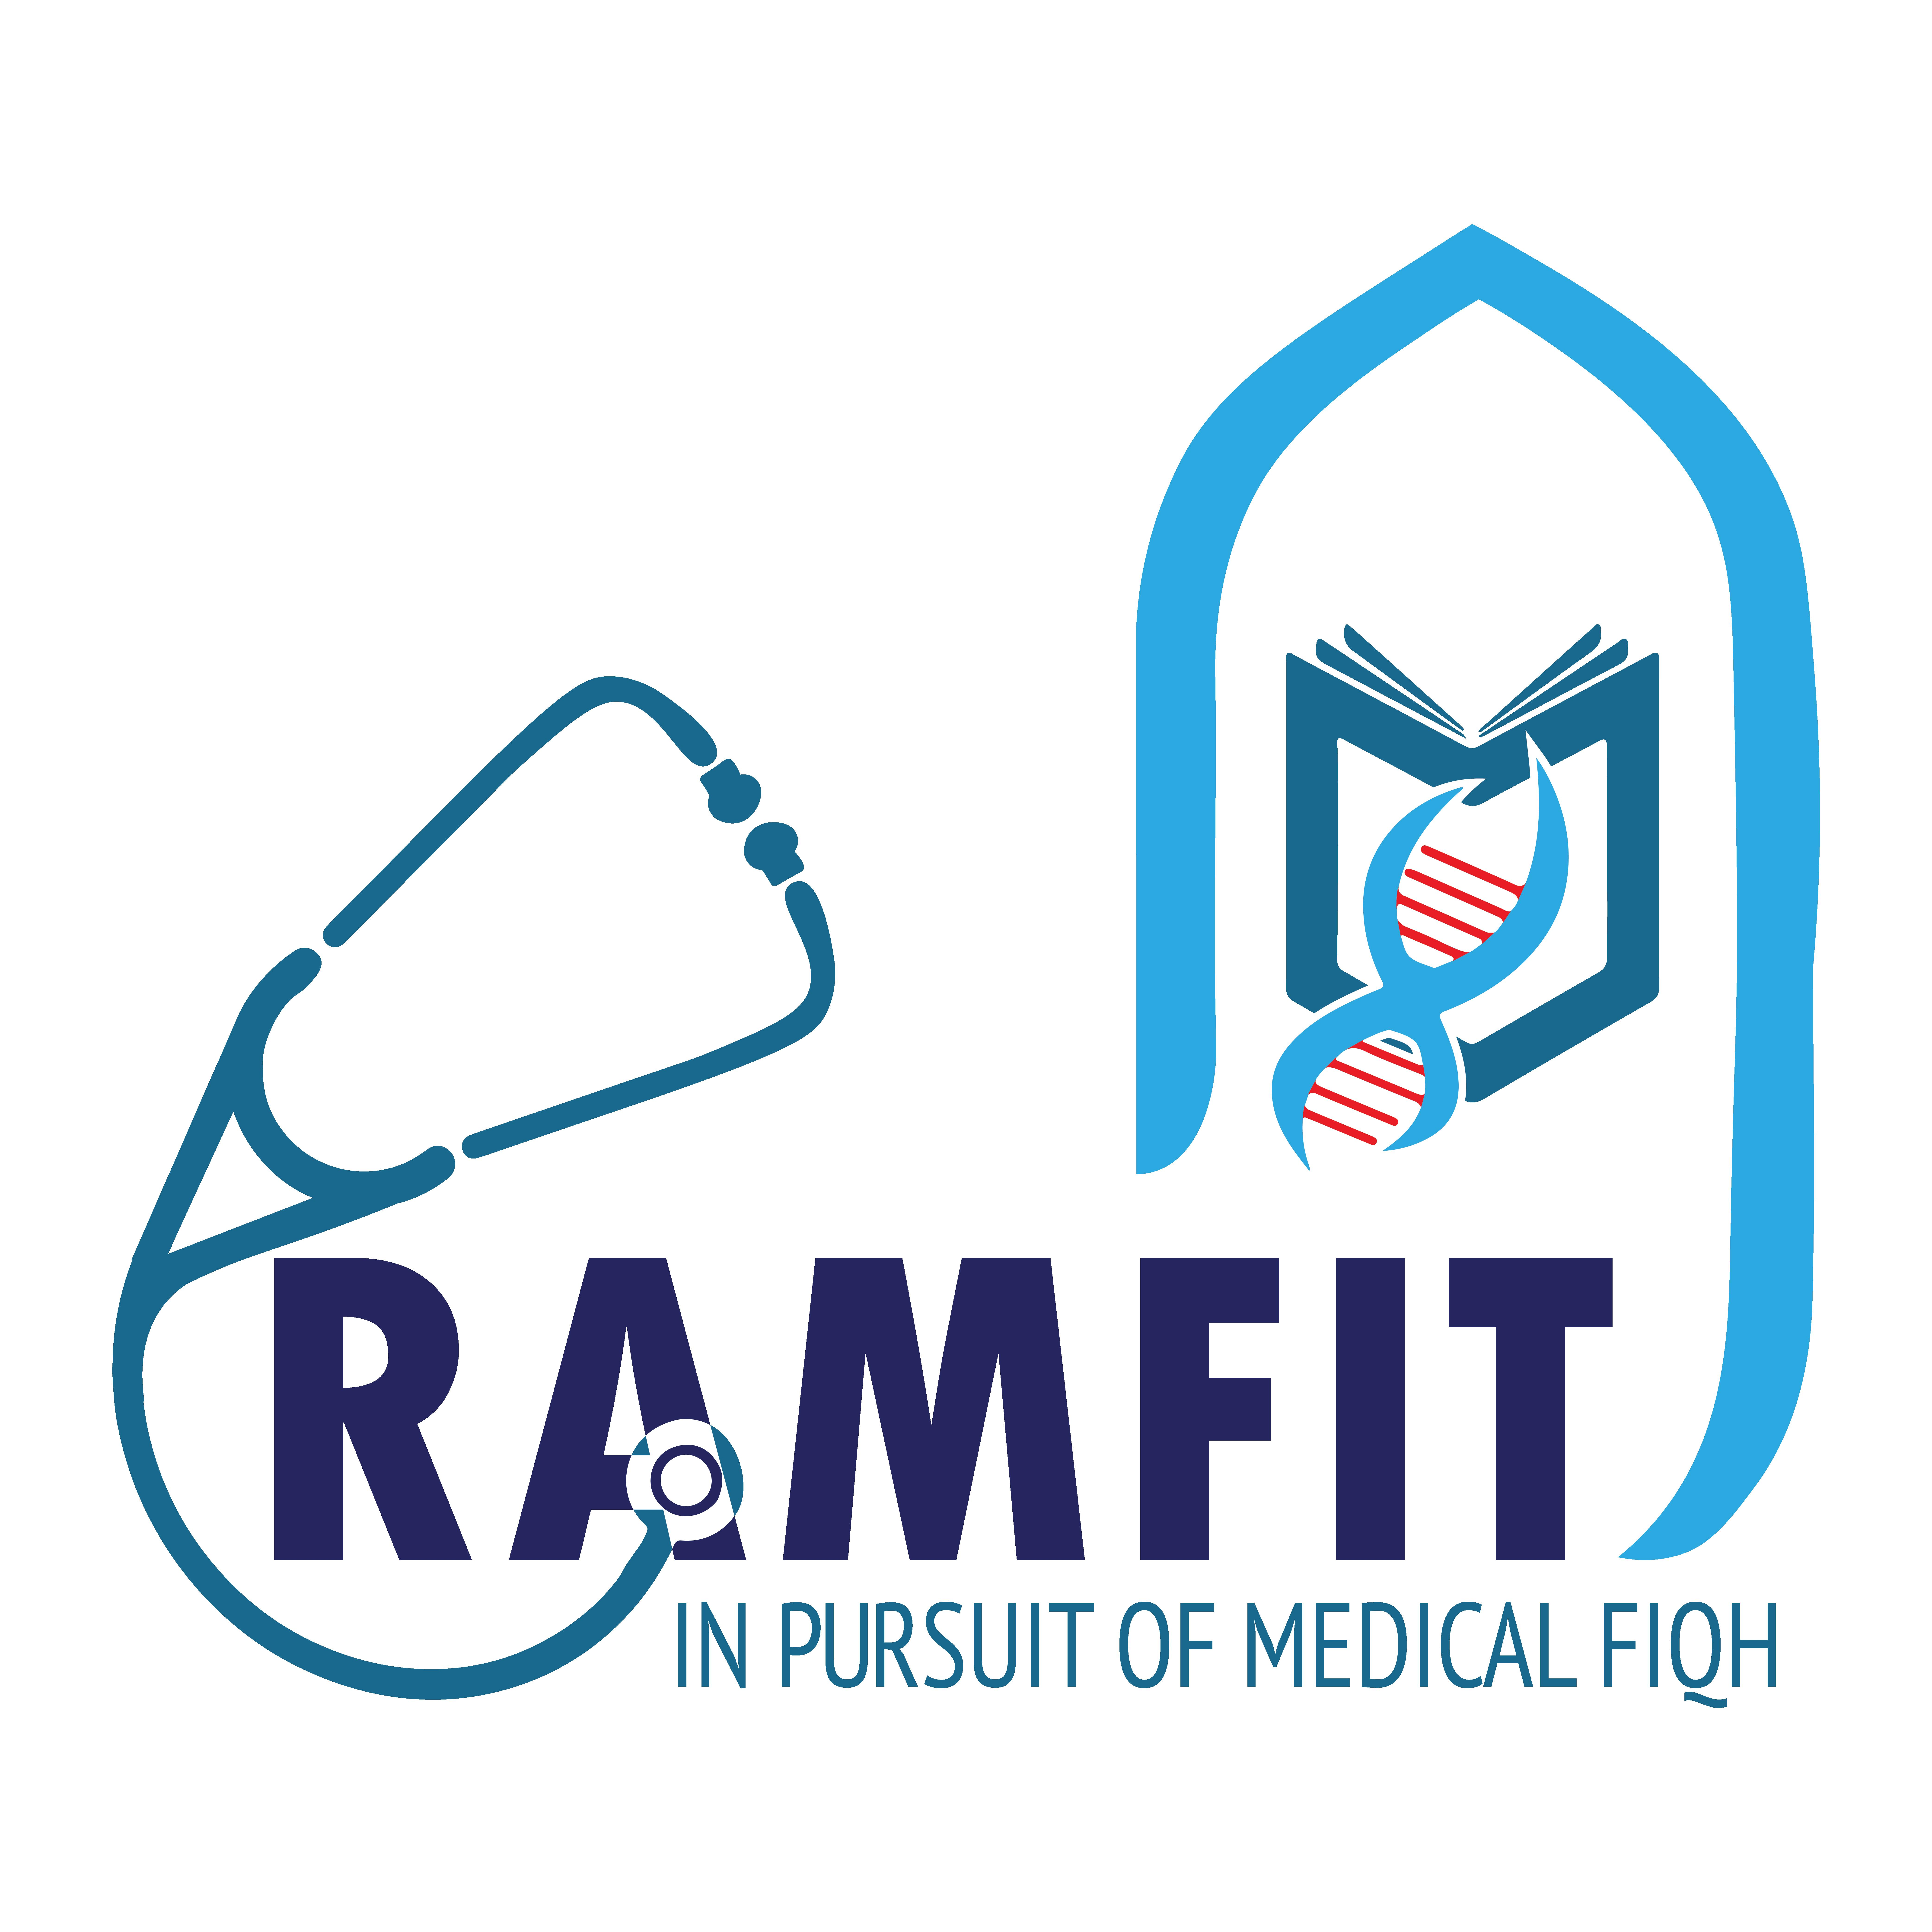 RAMFIT Logo 2000x2000_hd-new